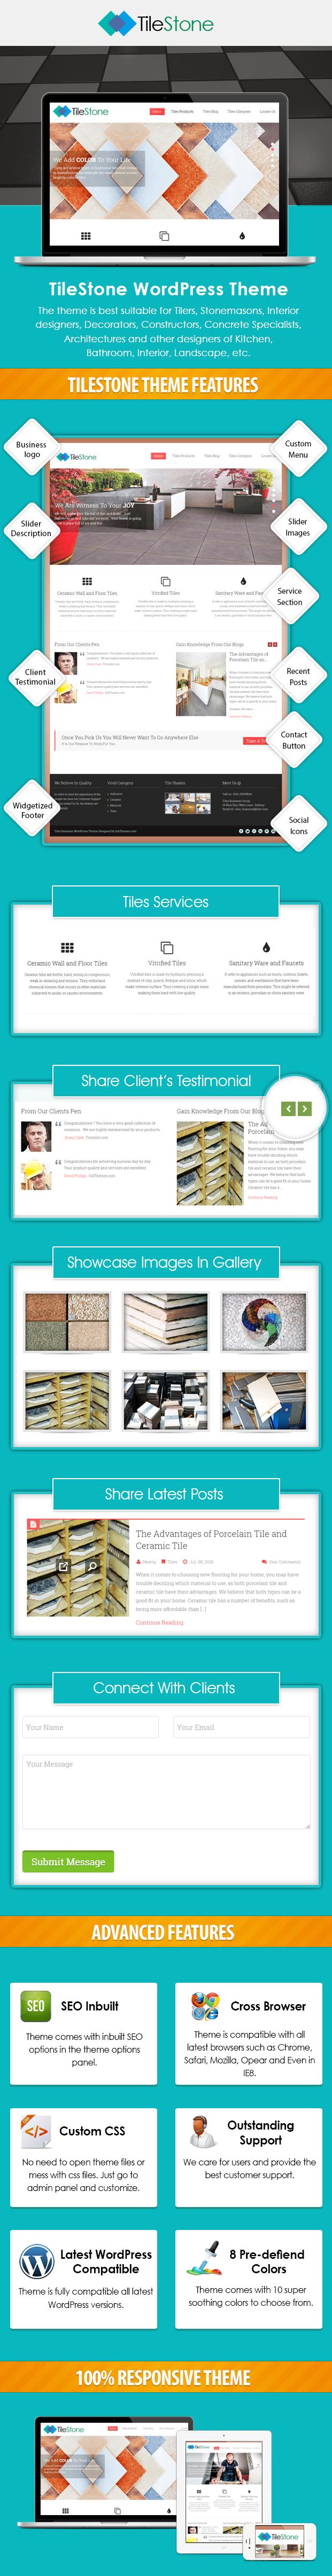 TileStone - Tiles Business WordPress Theme | InkThemes